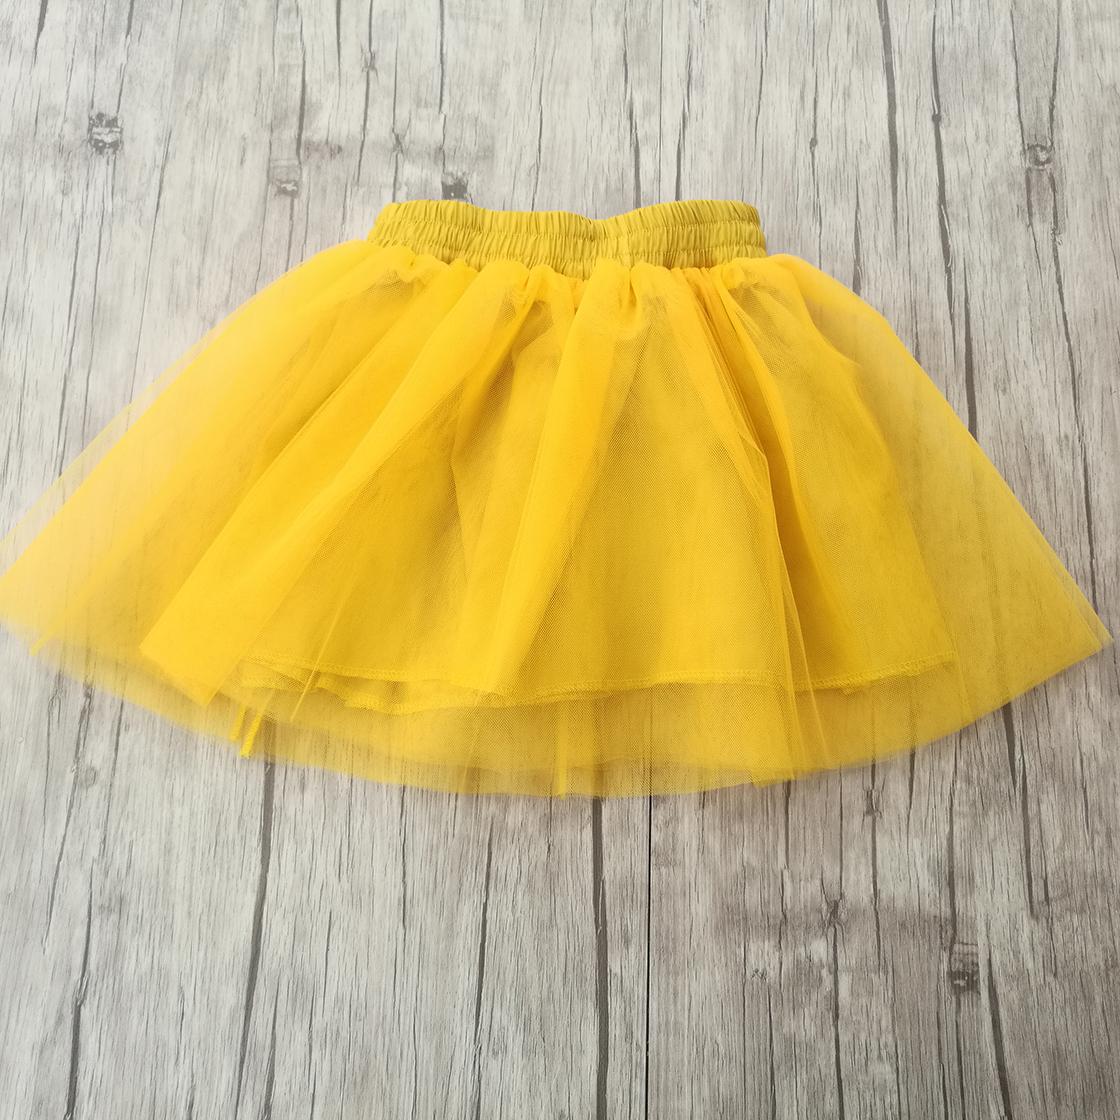 Summer Womens Mini Tulle Skirt Fairy Style Custom Made 5 layers saia Voile Bouffant Puffy Fashion Skirt Summer Tutu Skirts 3